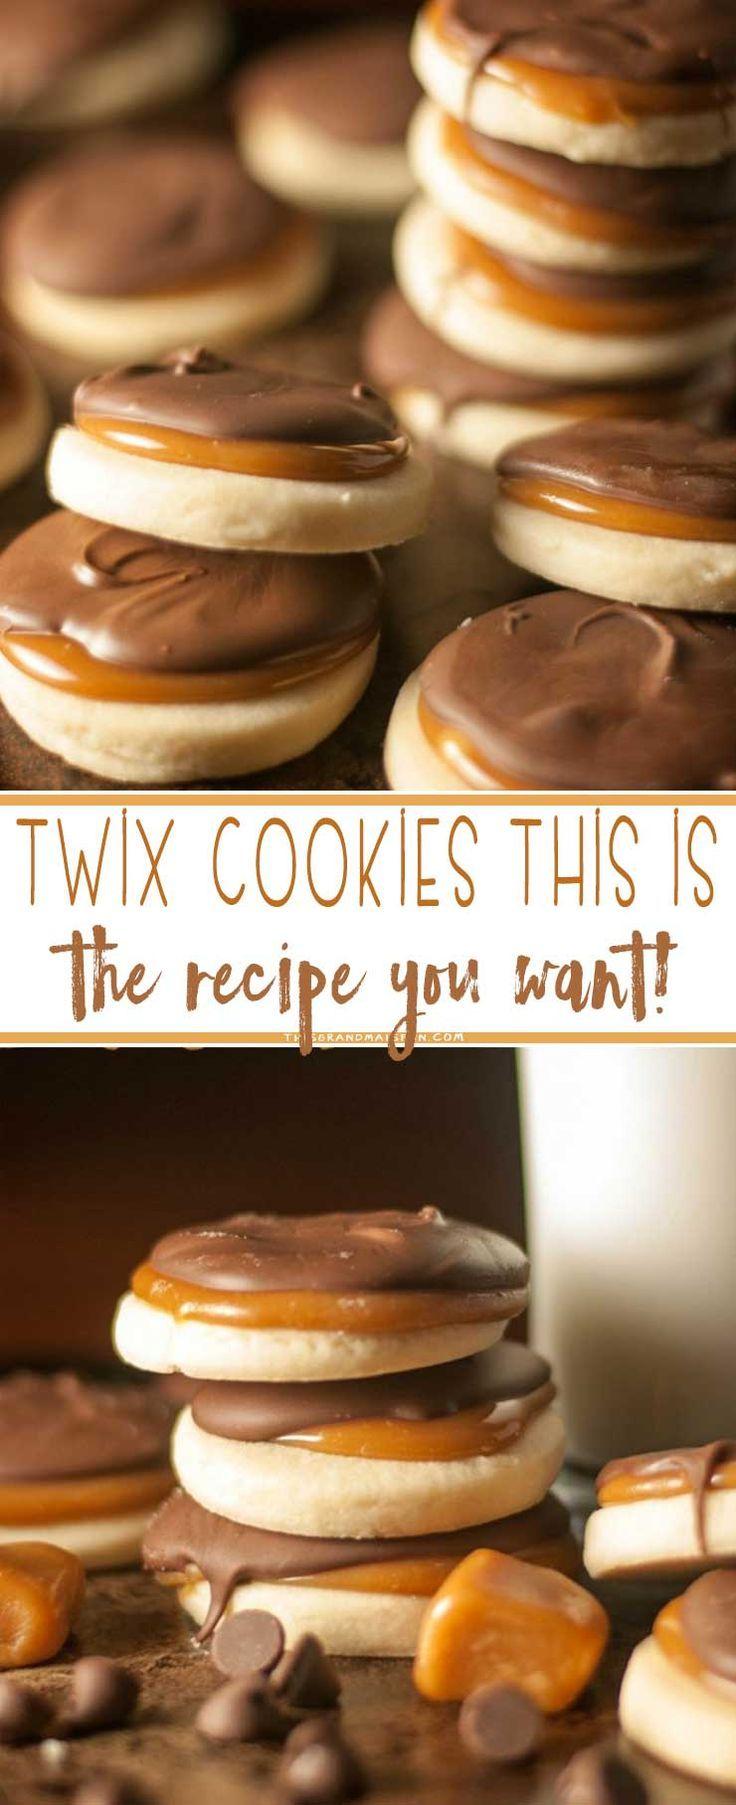 Twix Cookies Recipe Desserts Baking Cookie Recipes